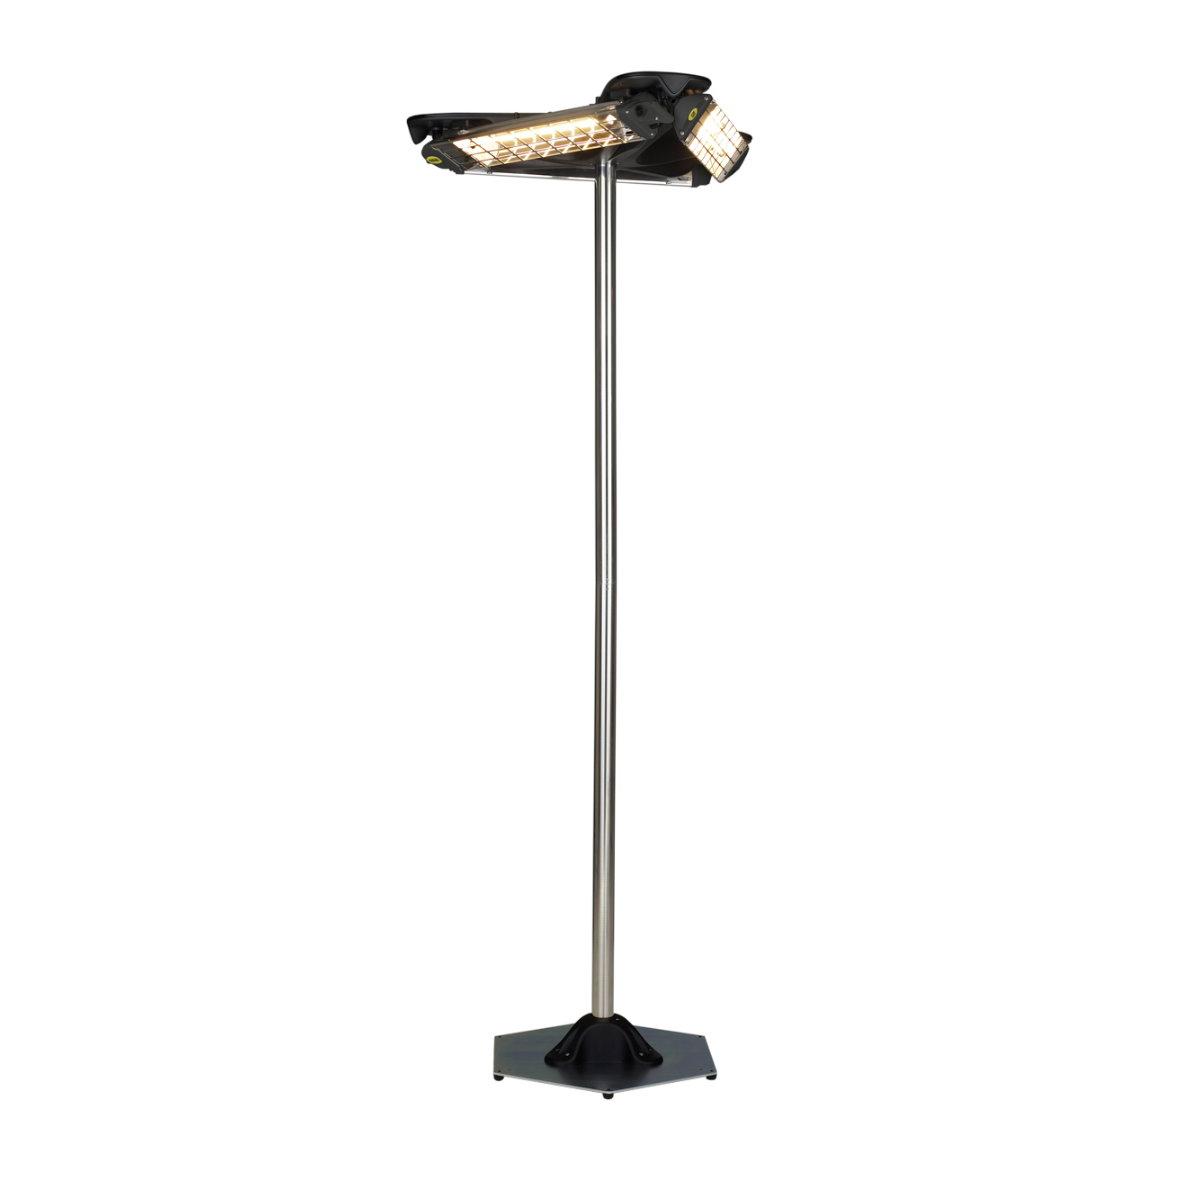 profi infrarot heizstrahler ip65 3600w 3er. Black Bedroom Furniture Sets. Home Design Ideas